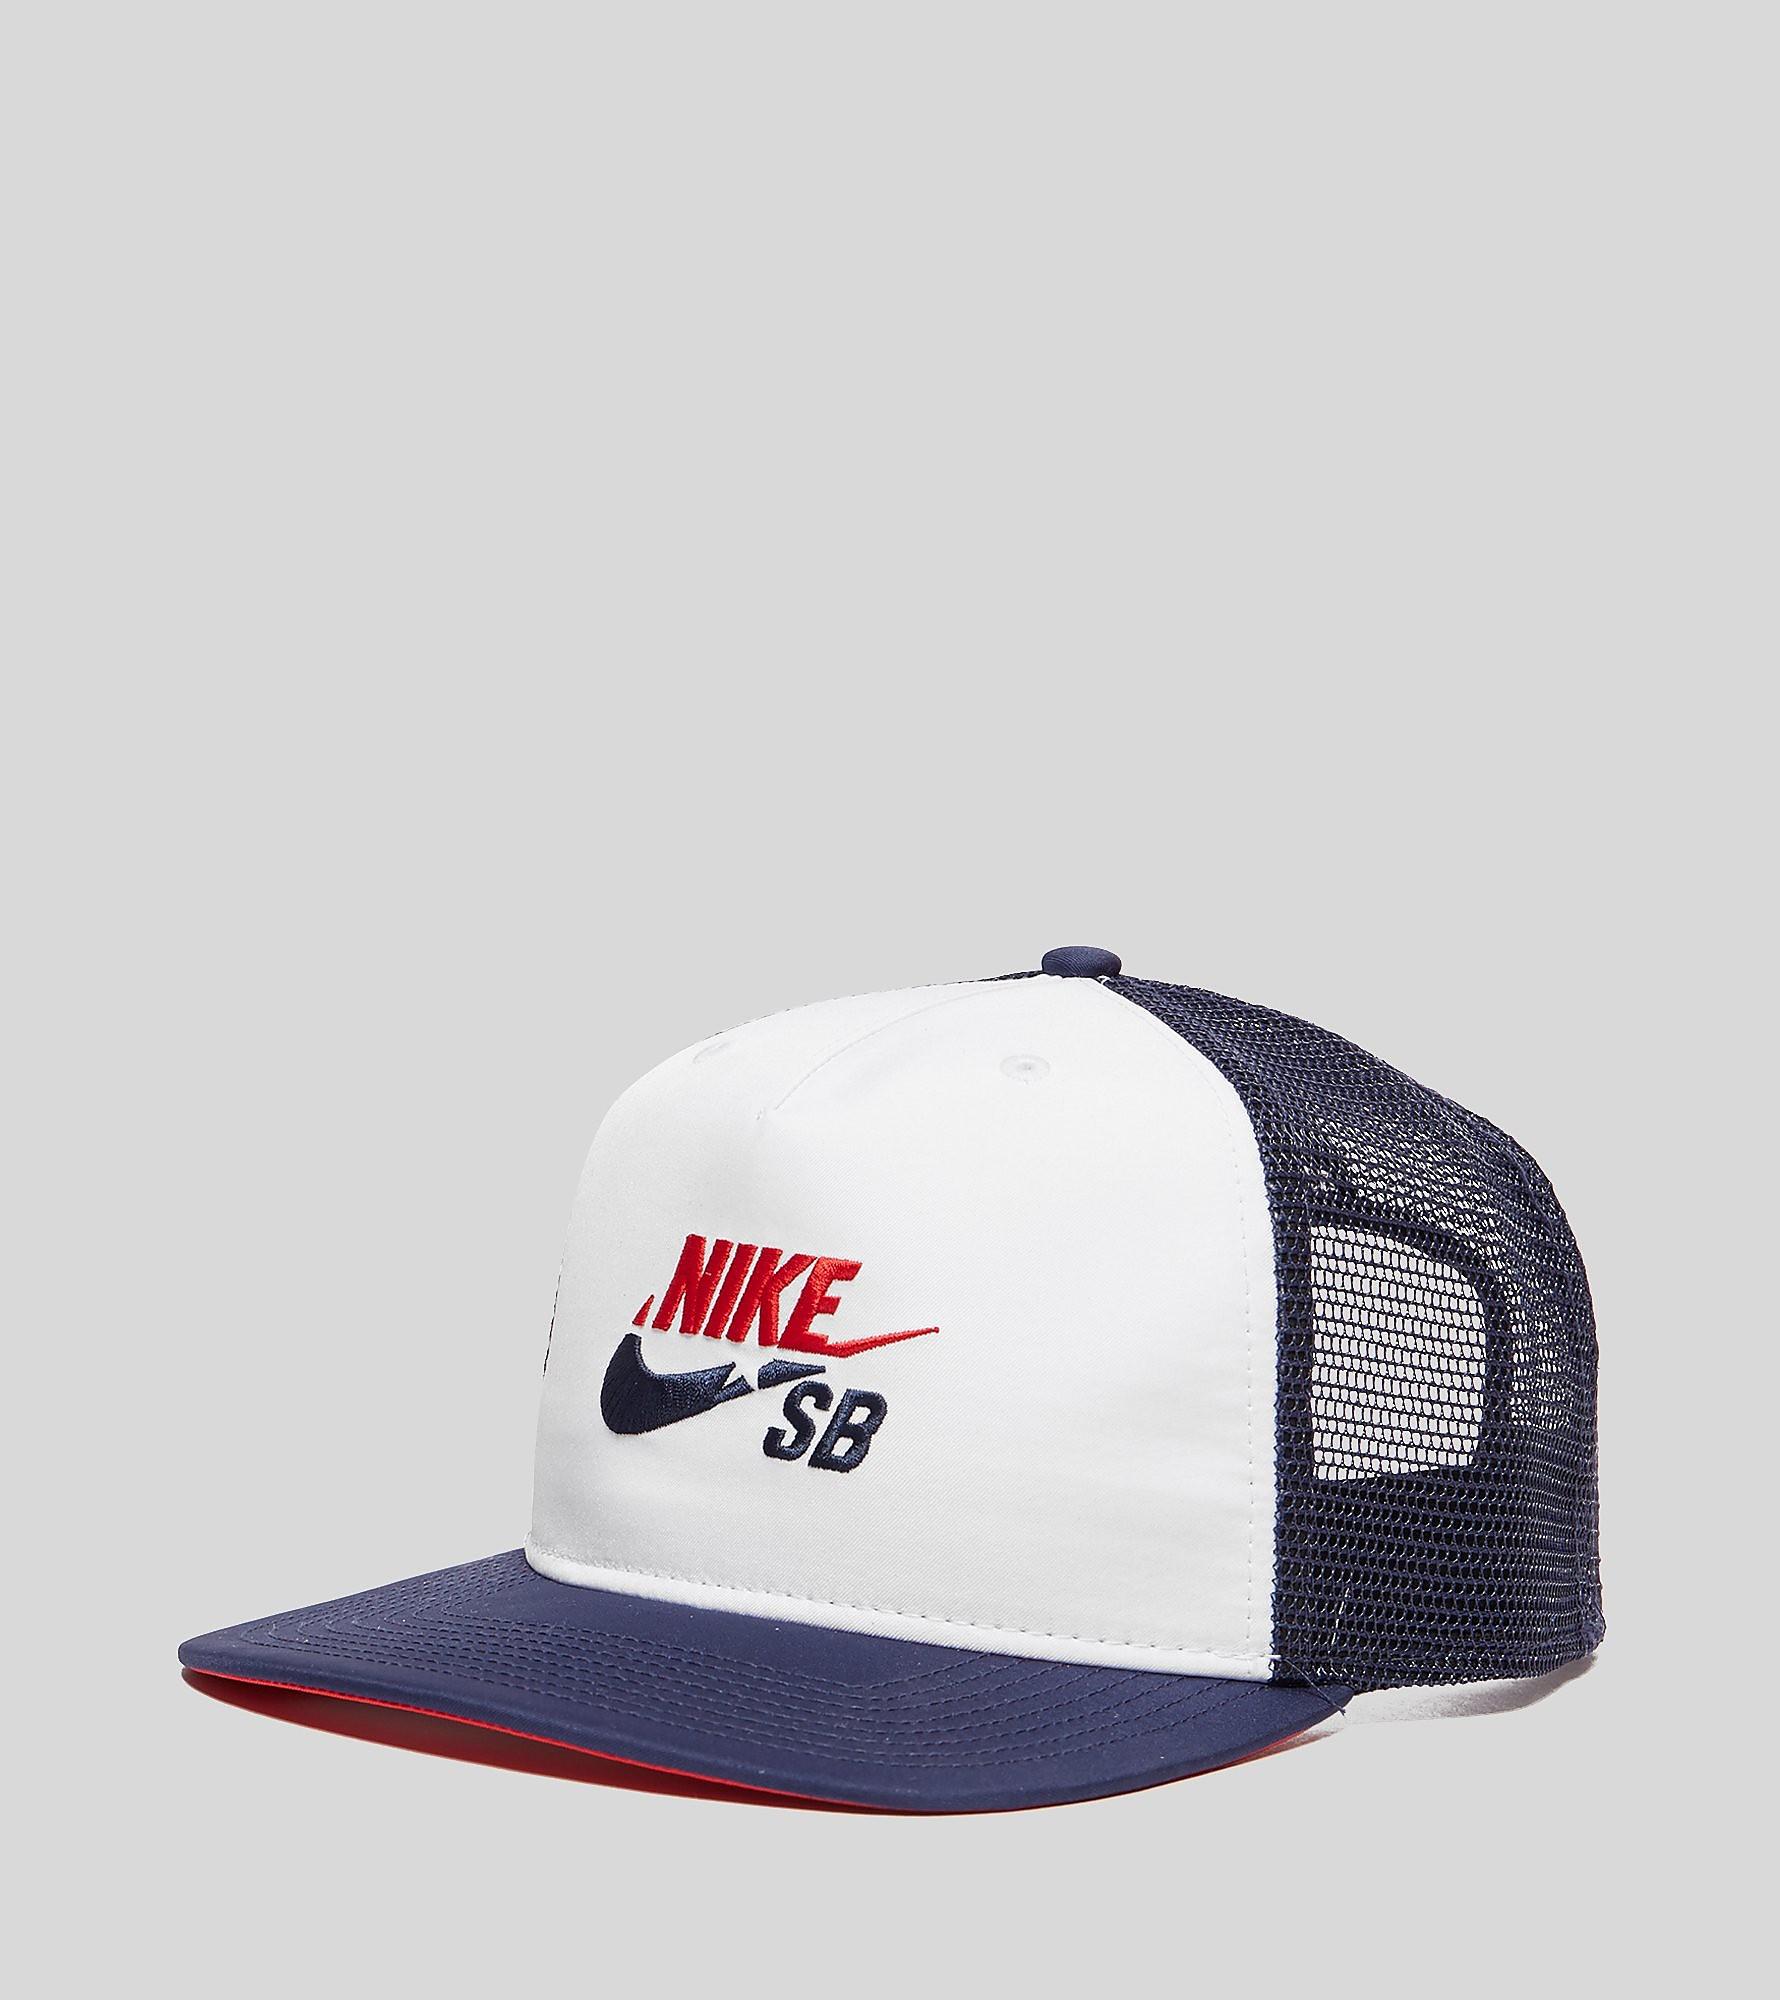 Nike SB Casquette Star Trucker